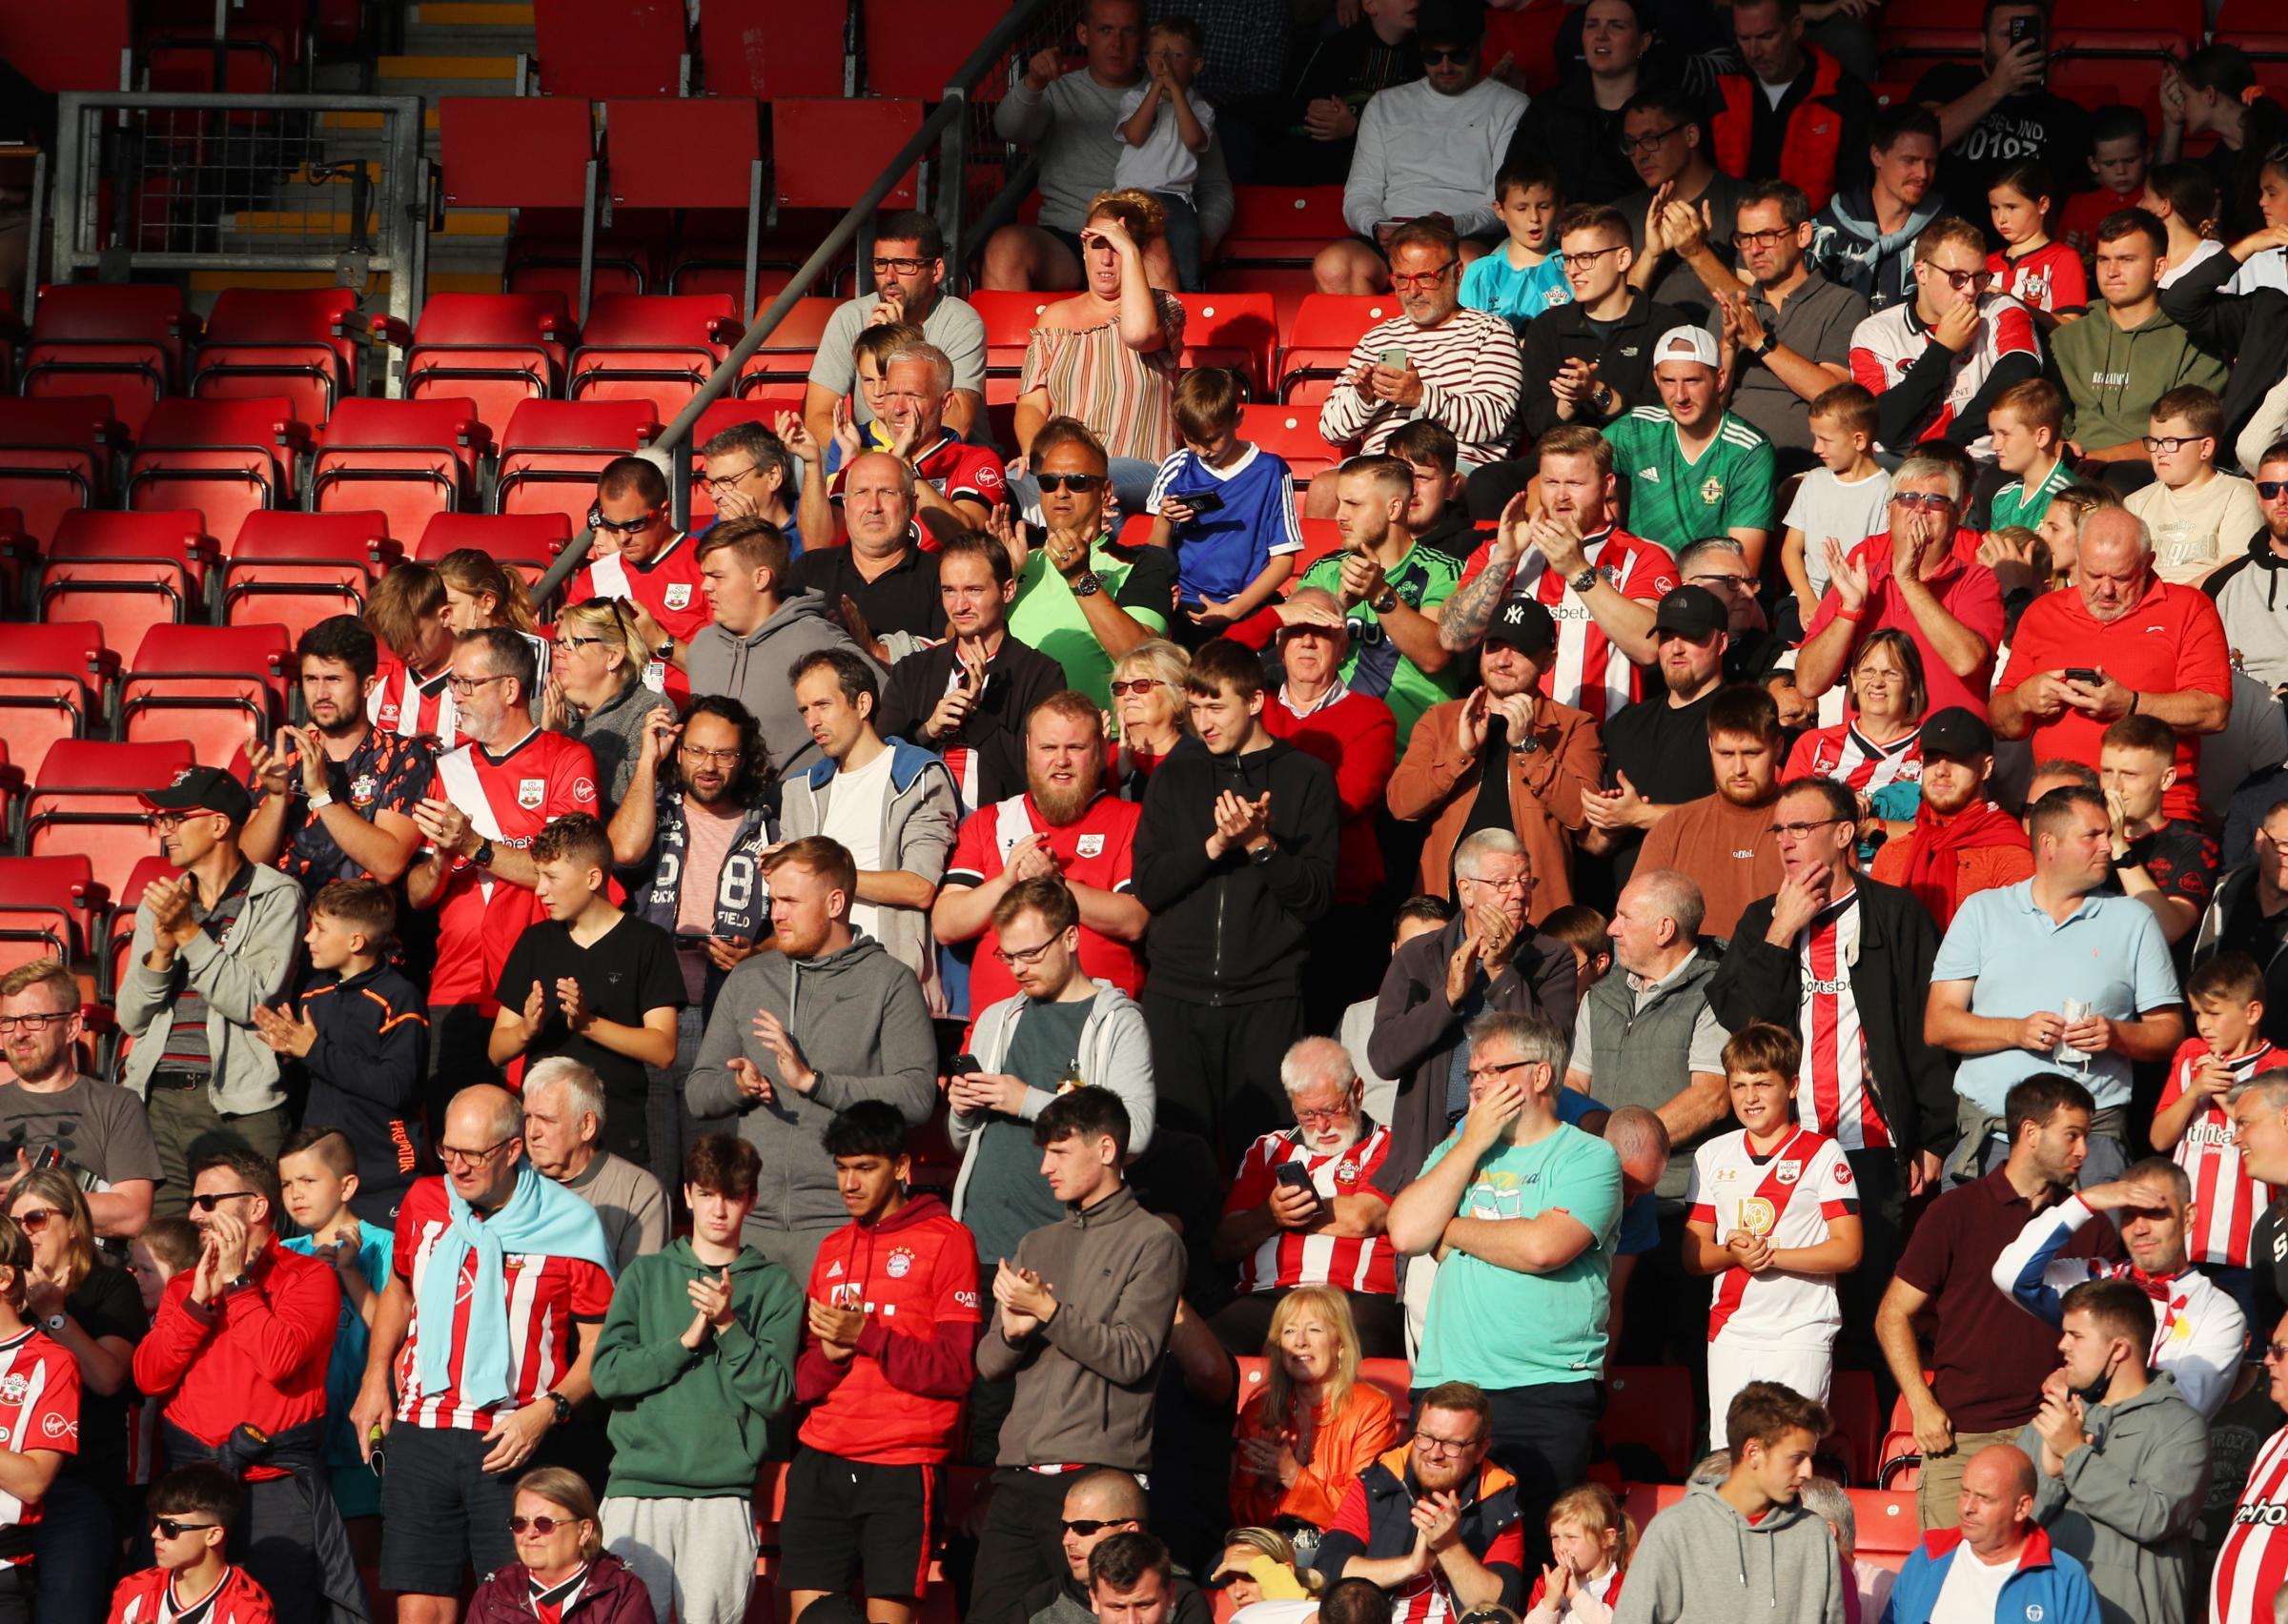 Premier League fans will face COVID-19 status spot-checks